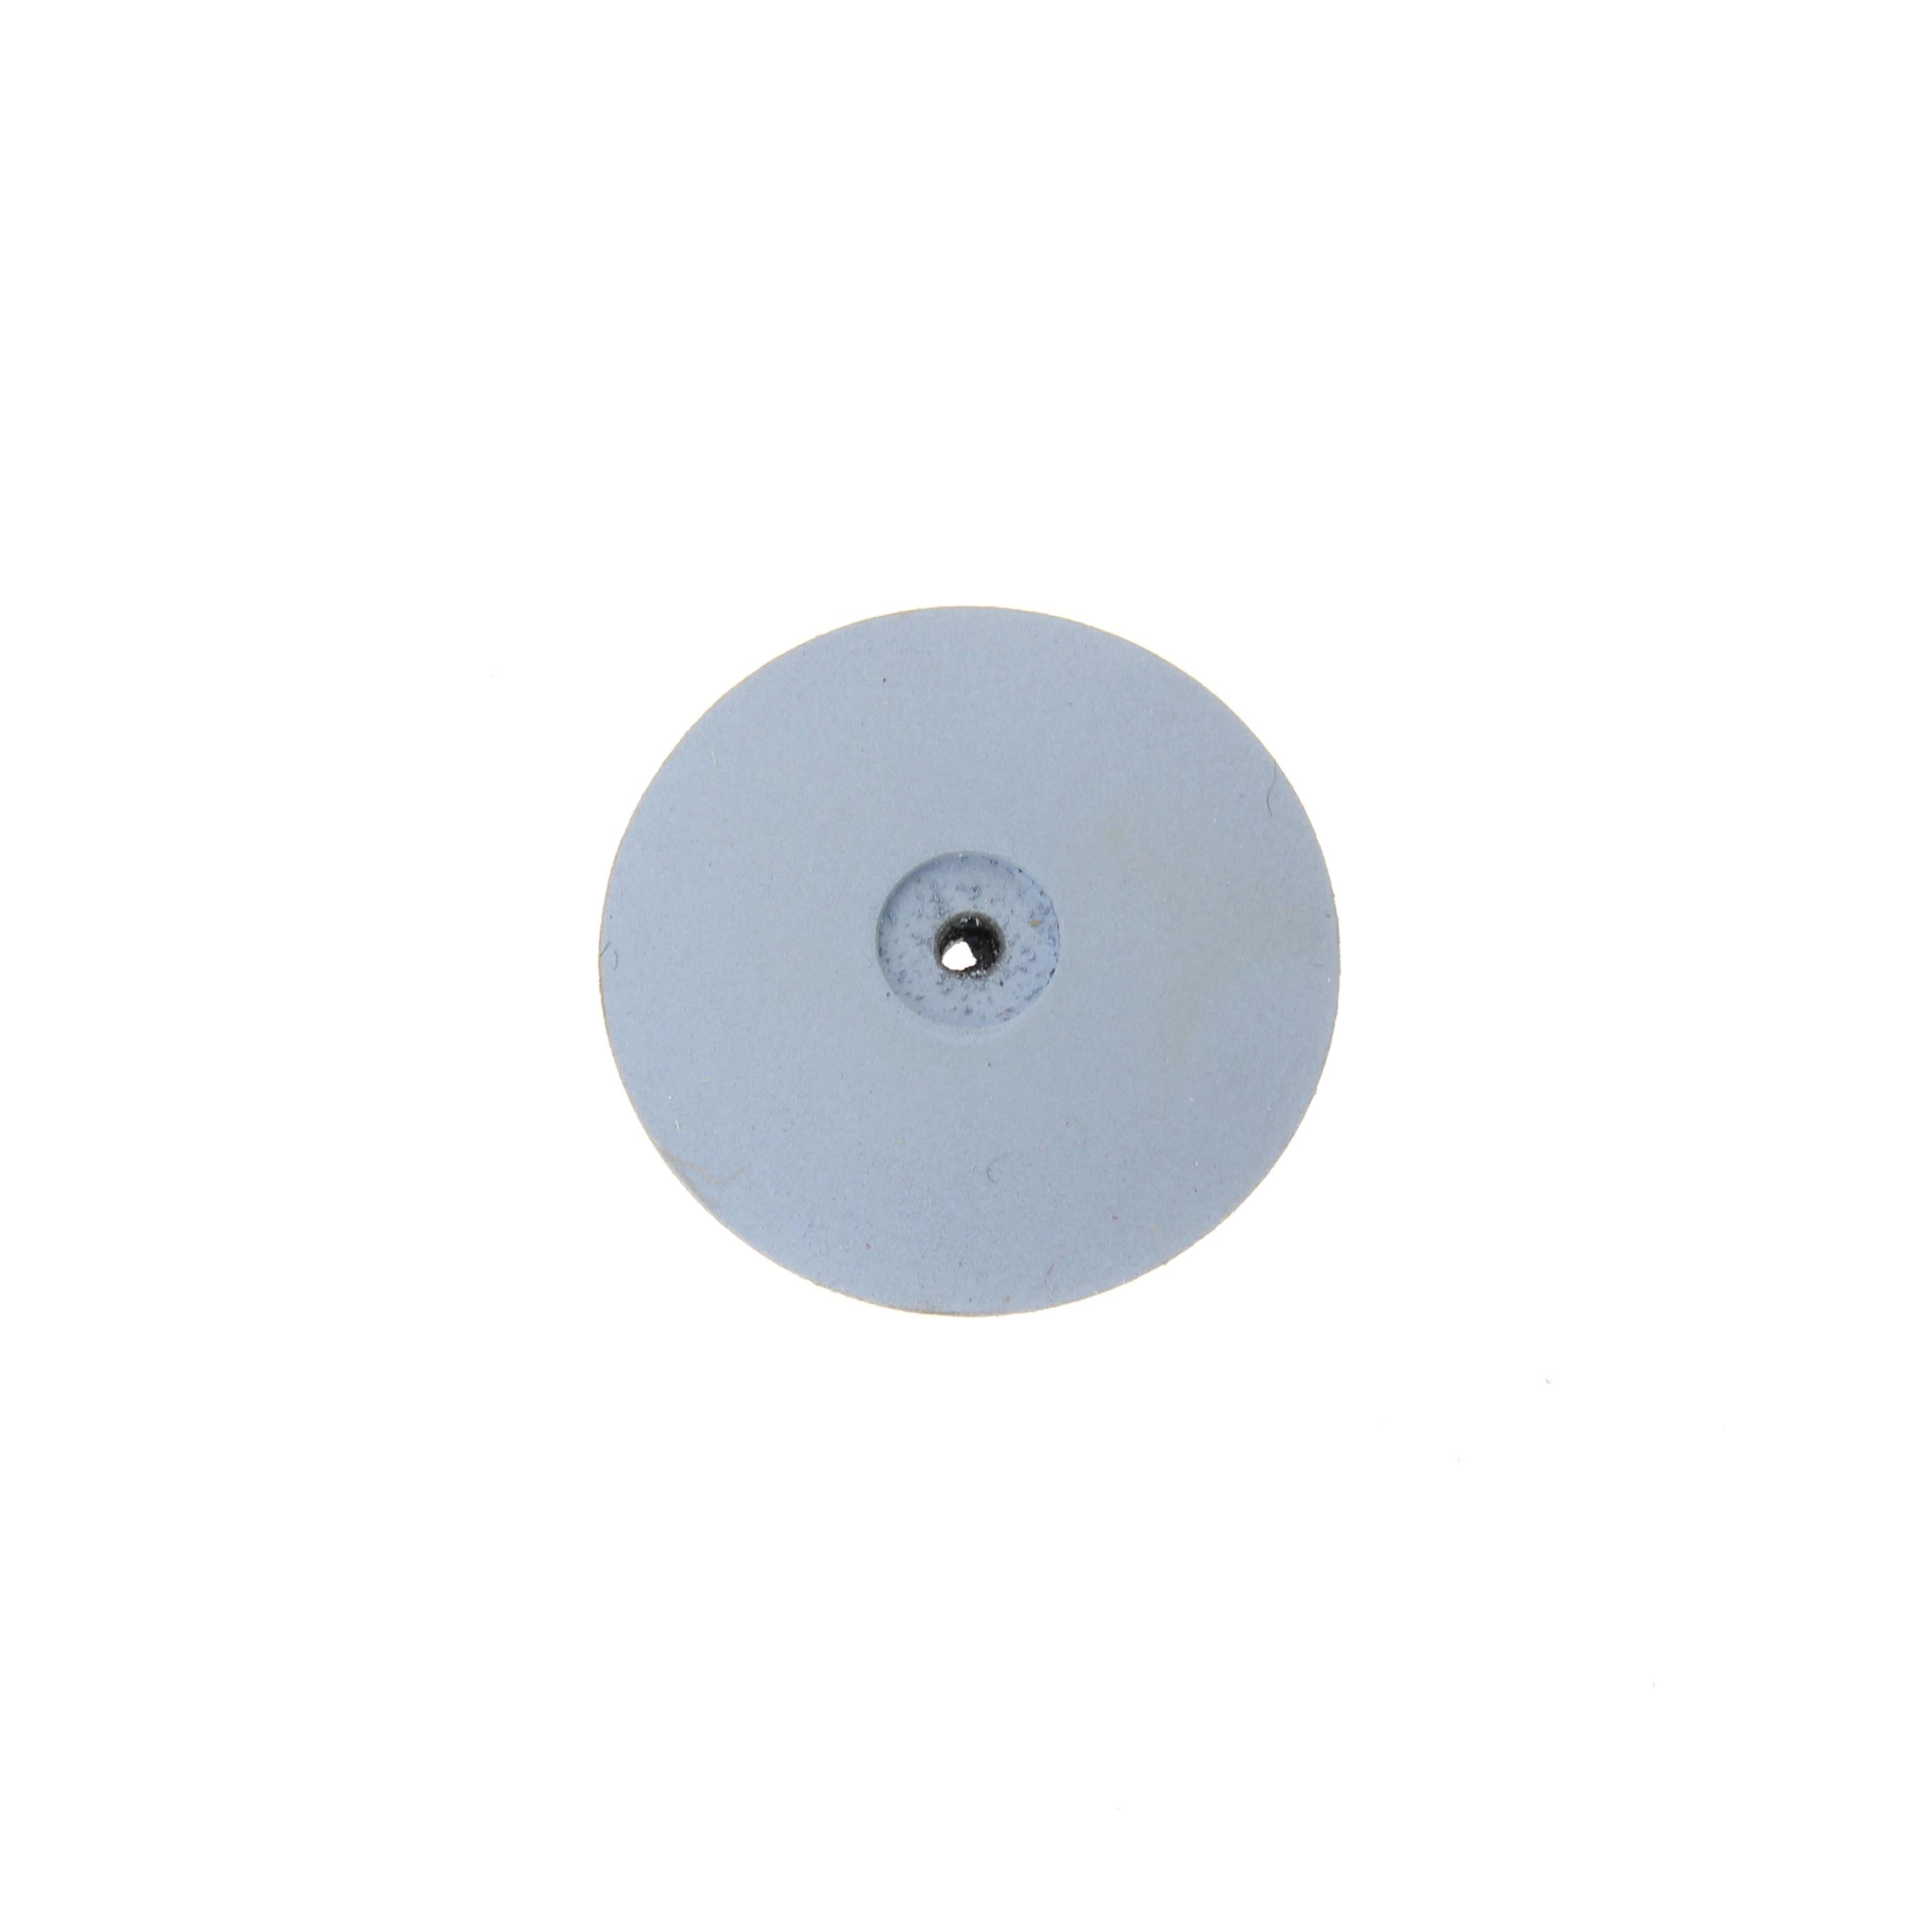 Резинка голубая б/д линза 22х4 L22f